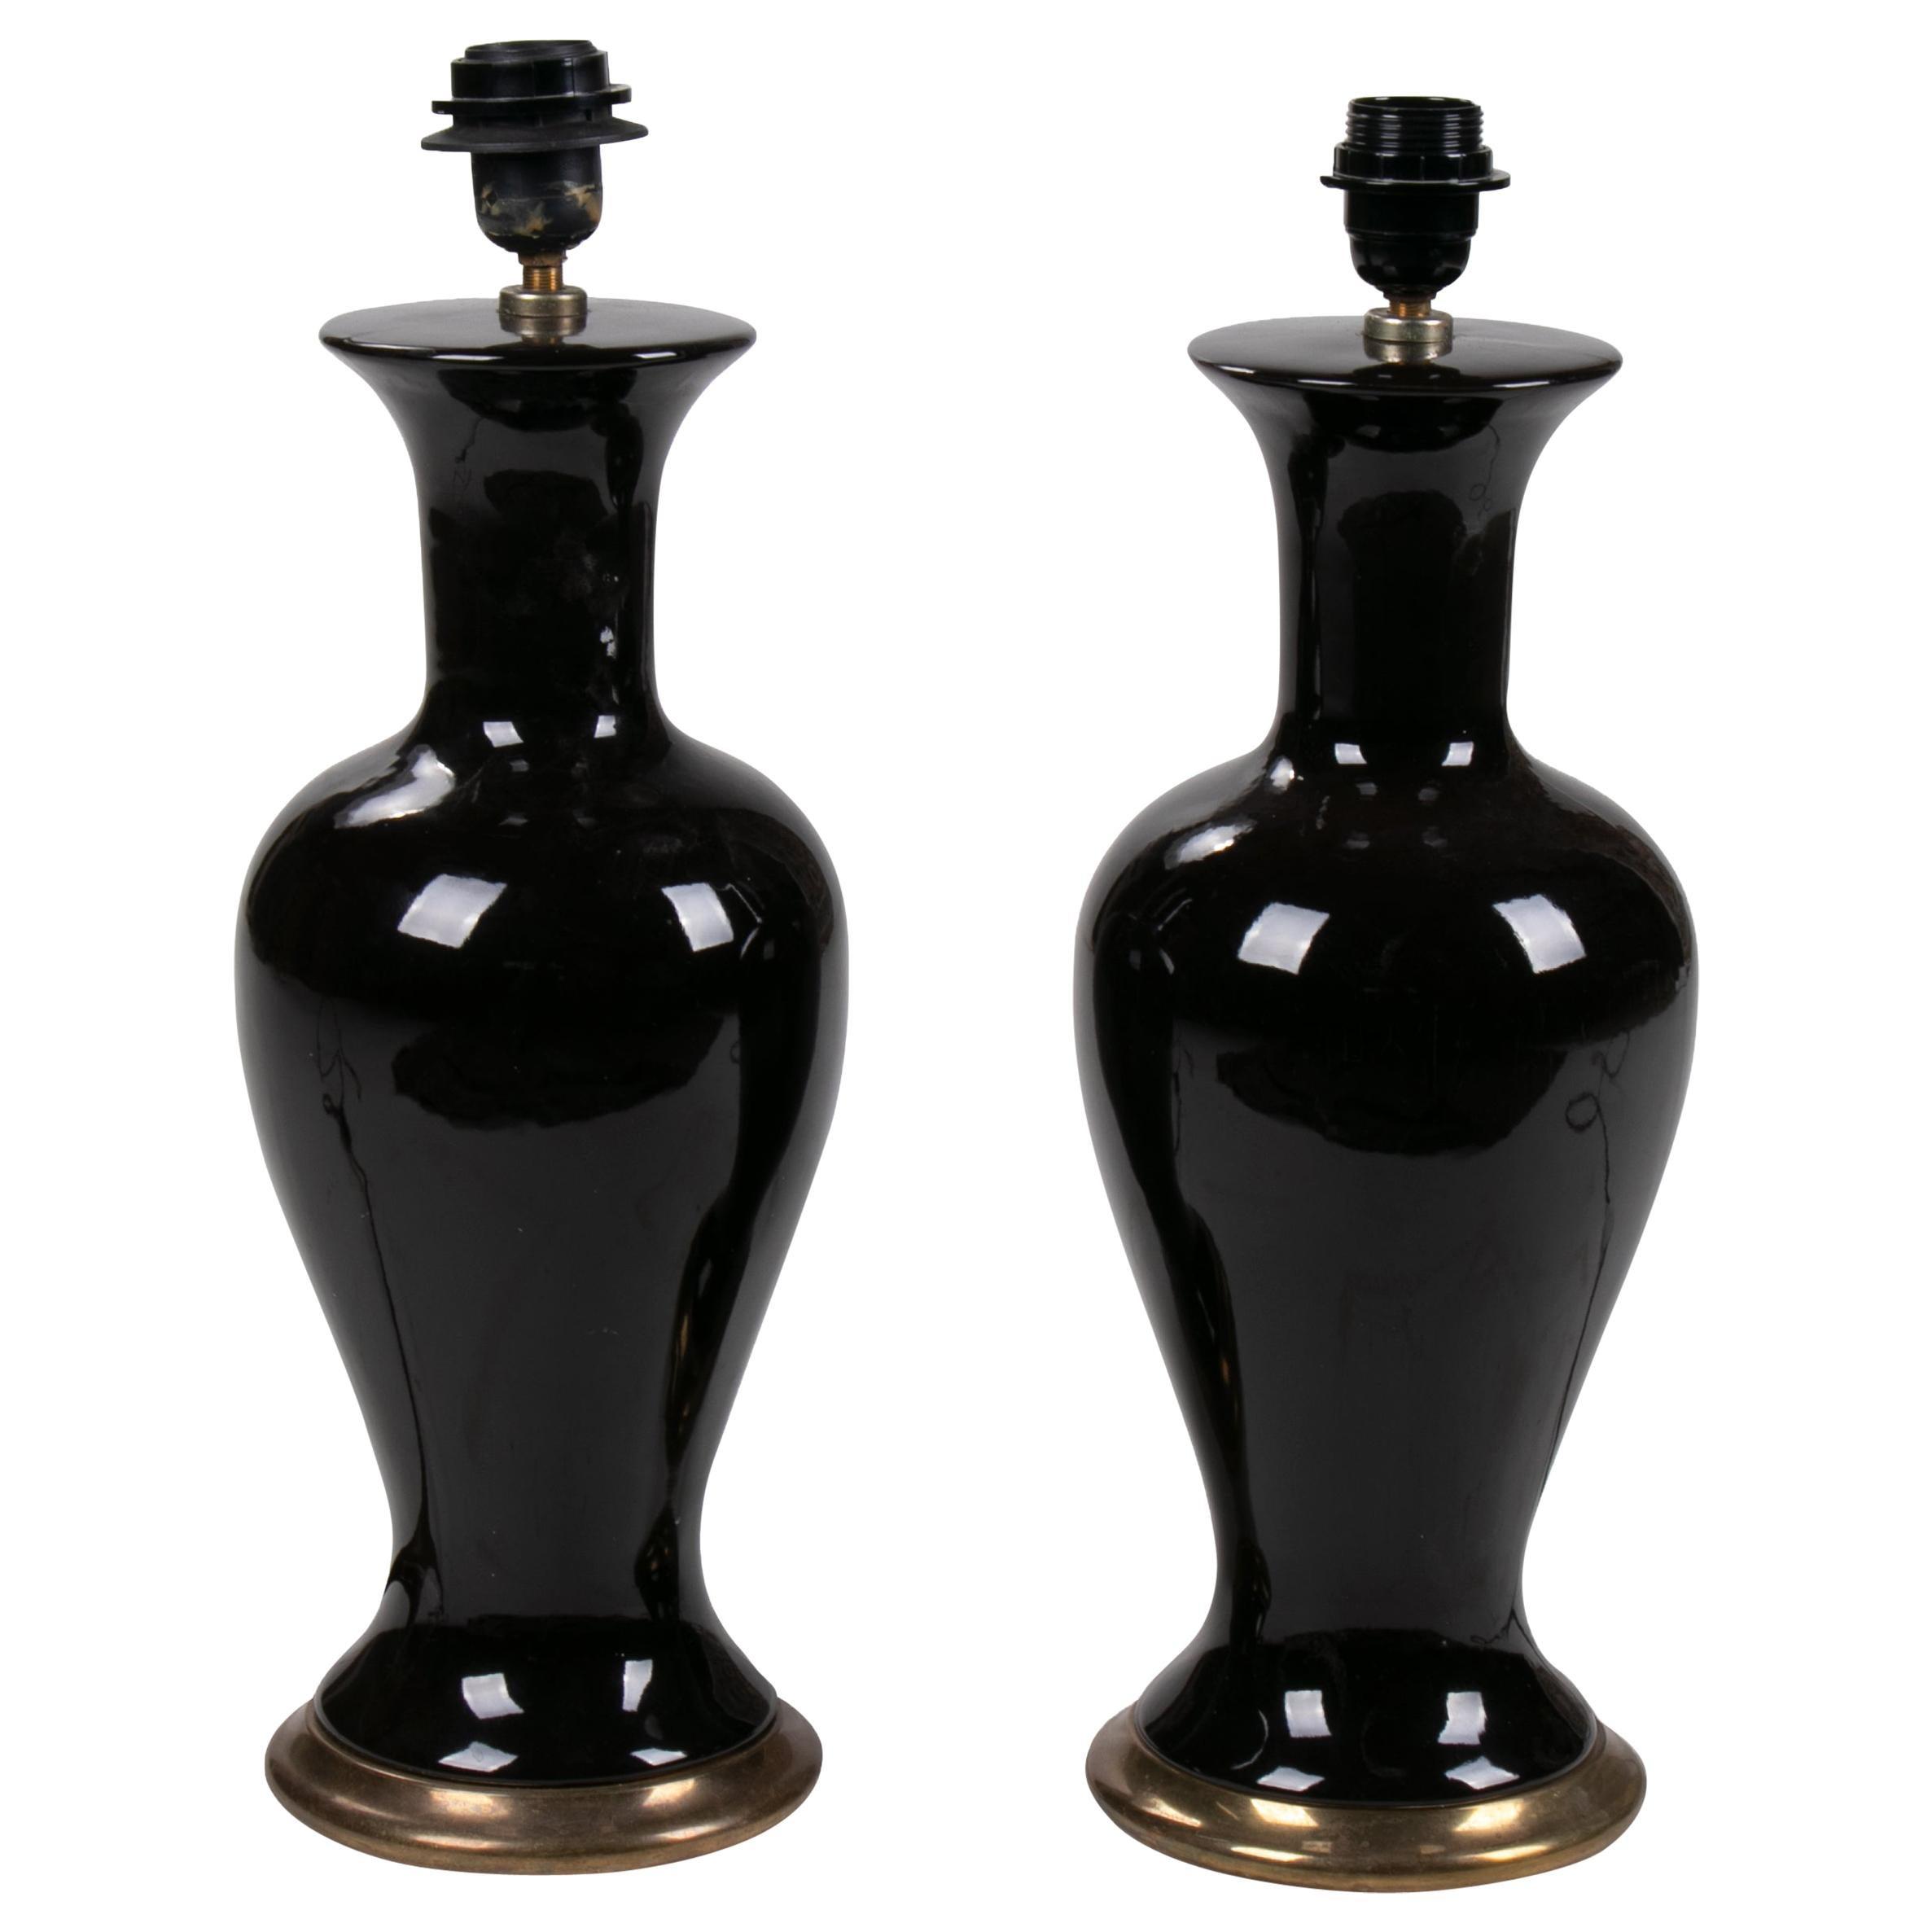 1970s Pair of English Black Ceramic Table Lamps